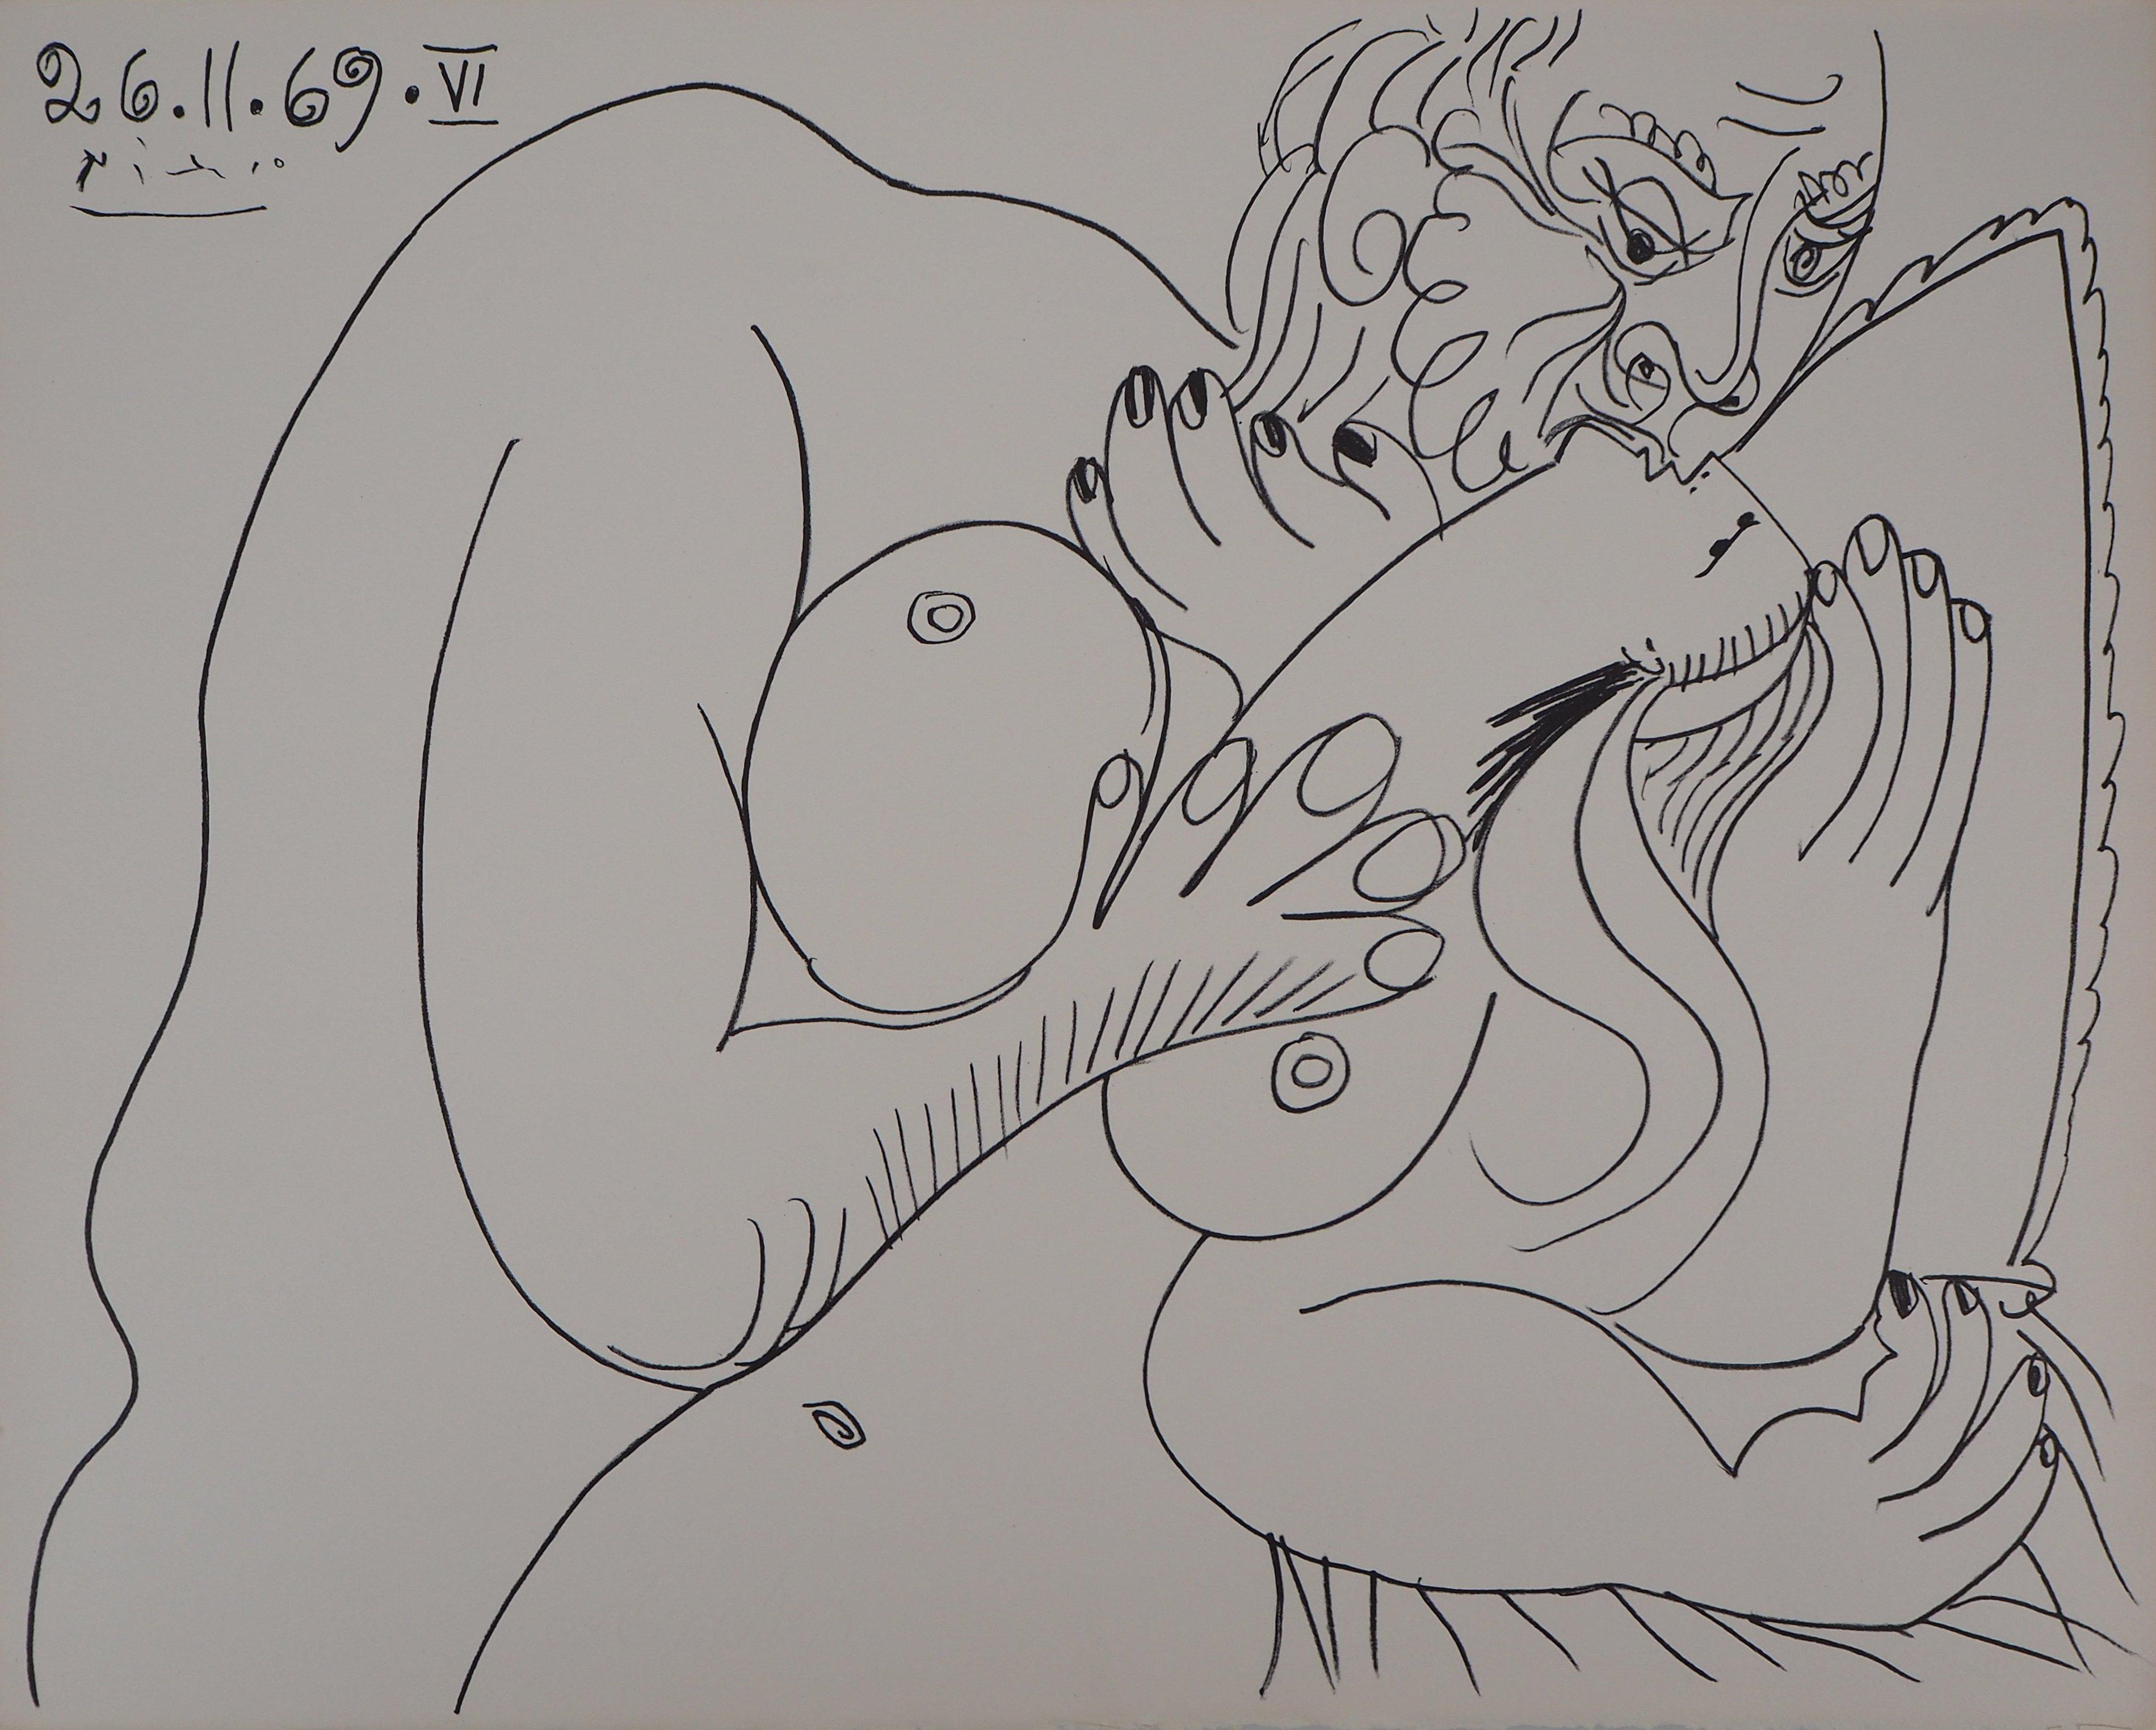 The Kiss - Lithograph (Mourlot 1971)